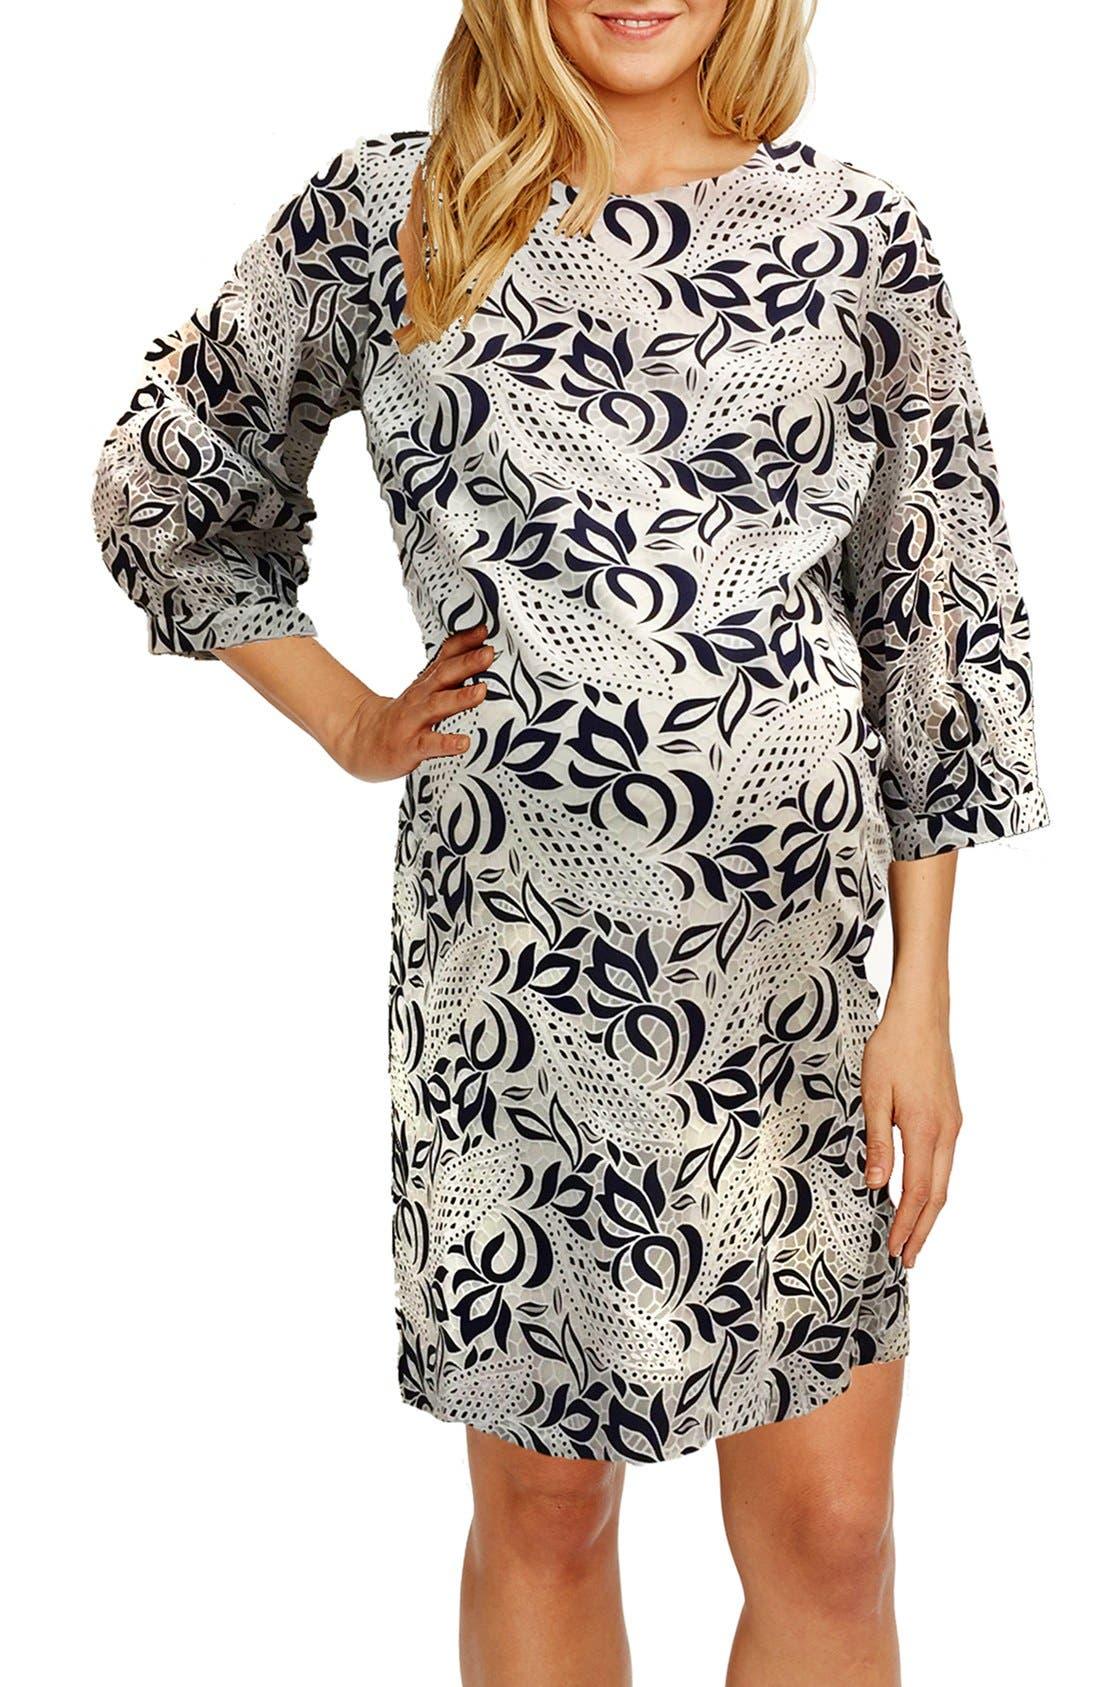 'Kelly' Lace Maternity Dress,                             Main thumbnail 1, color,                             NAVY/ WHITE